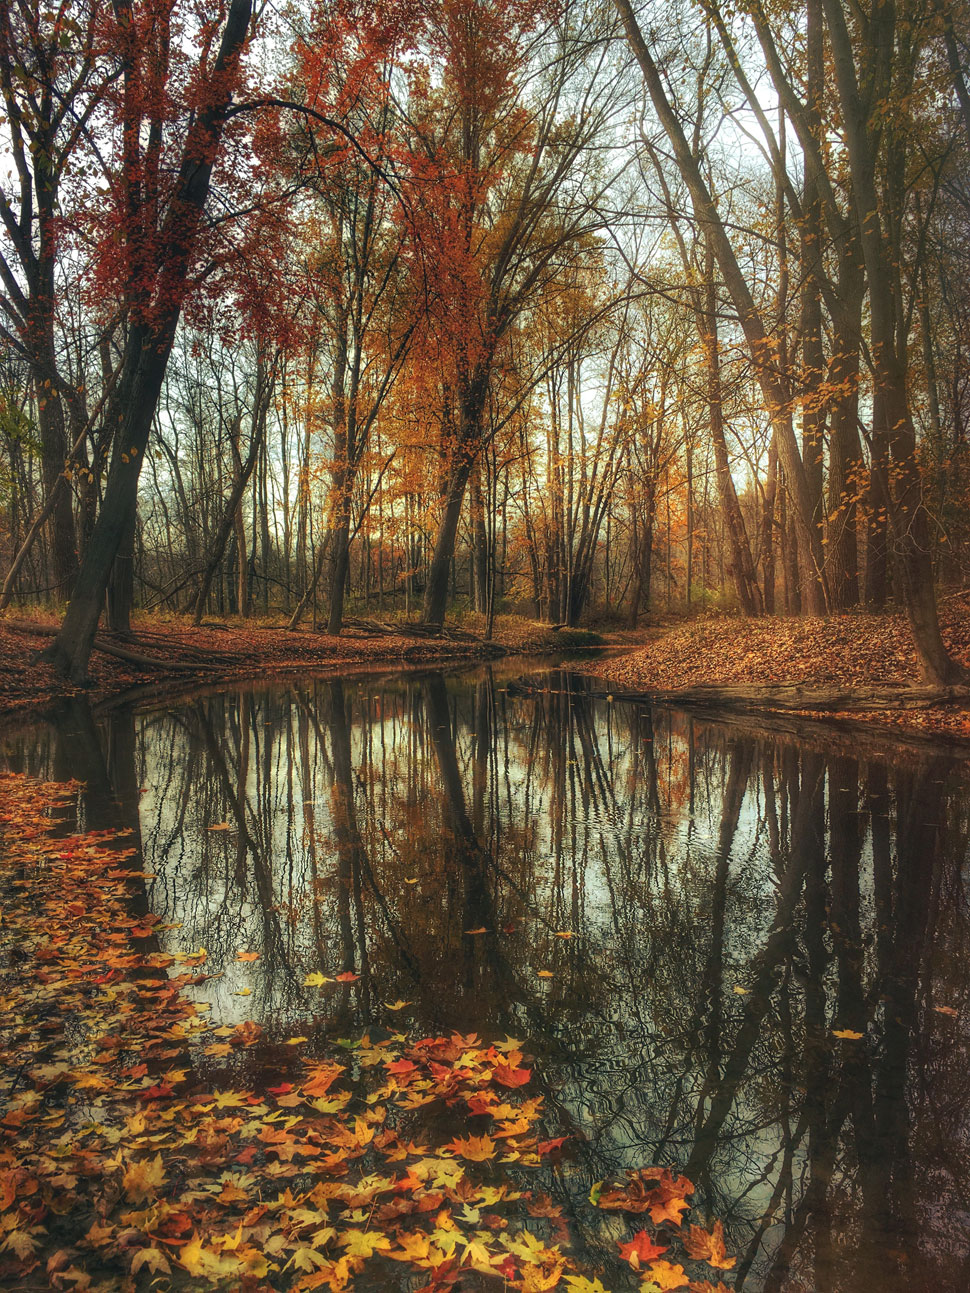 cc0; 关 键 词: 高清摄影大图图片素材自然风景风光树木大树秋天树叶